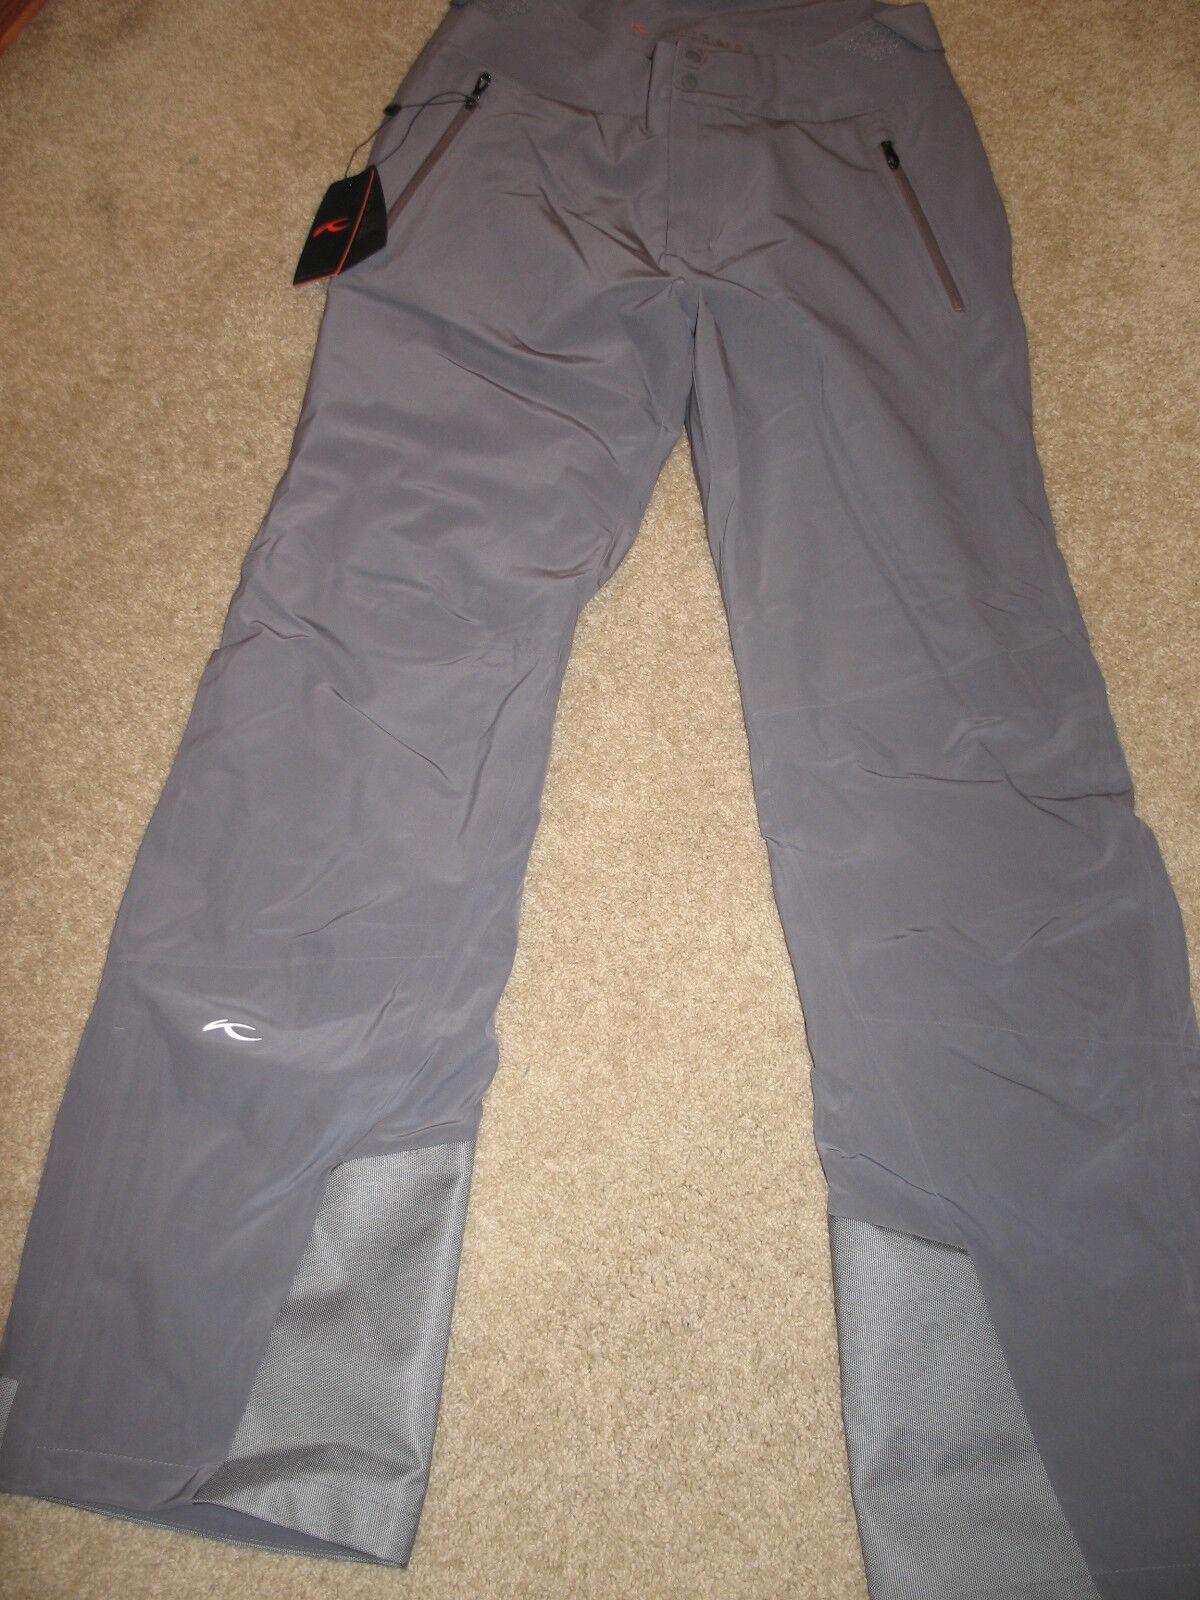 KJUS  Formula Pro Ski Pants Waterproof, Insulated (For  Men).M(50 Long).G .NWT.  quality assurance